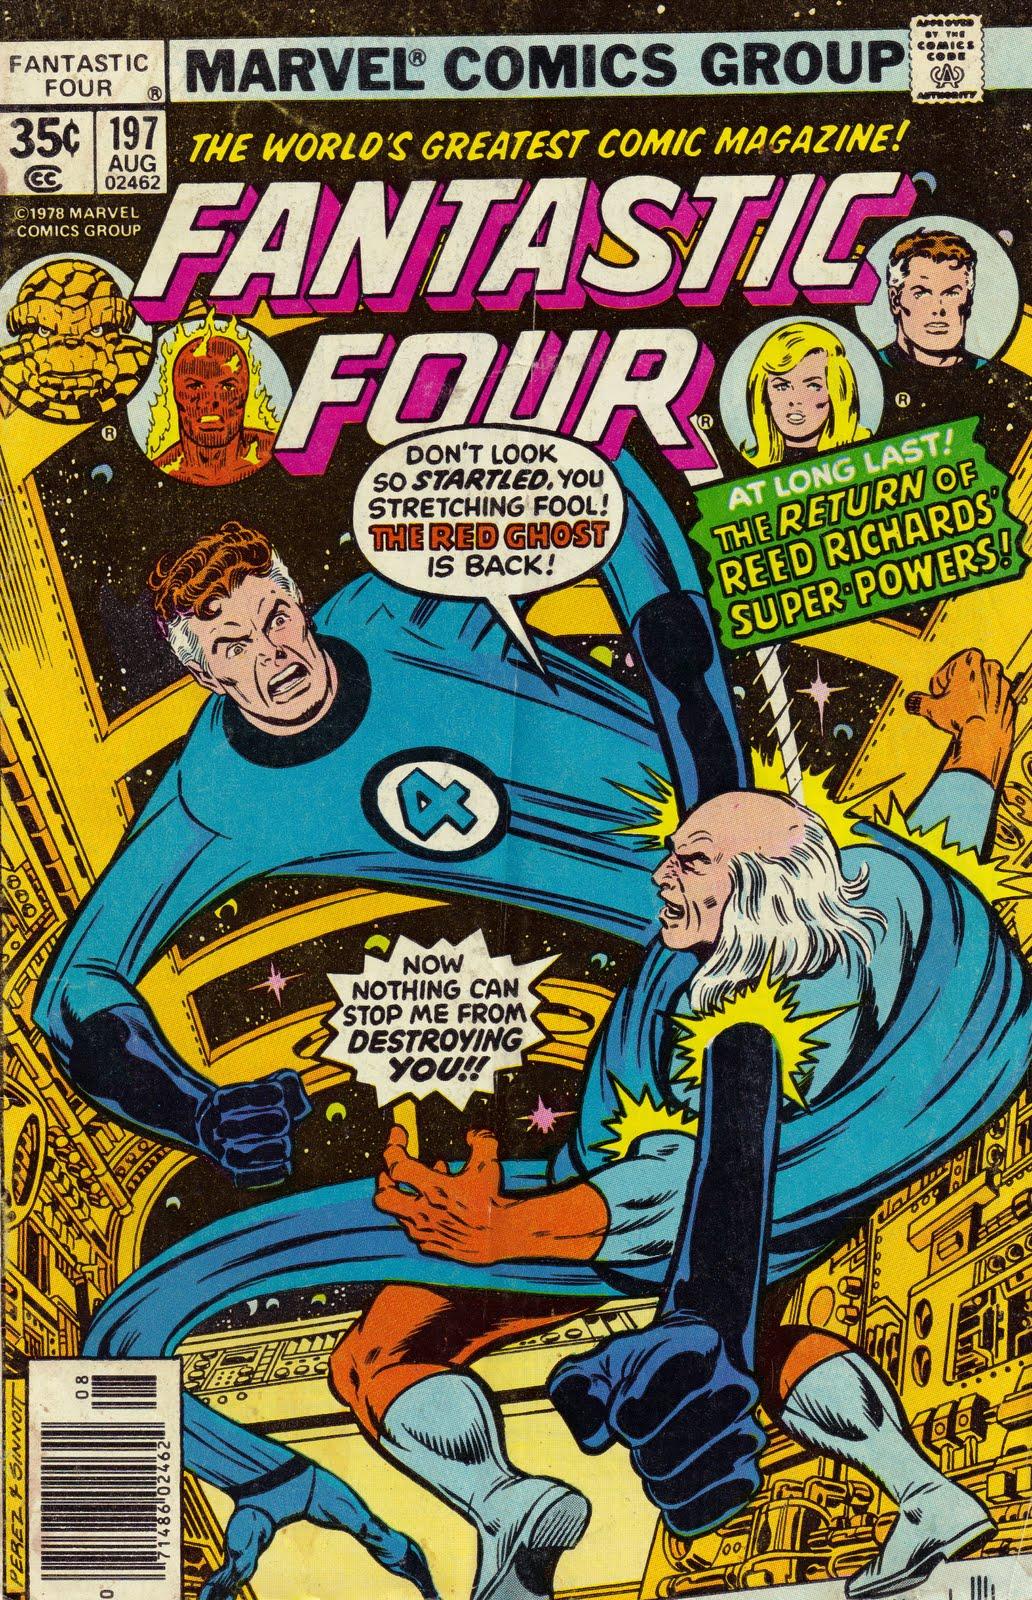 Creativegarbagedump: More Comic Book Covers